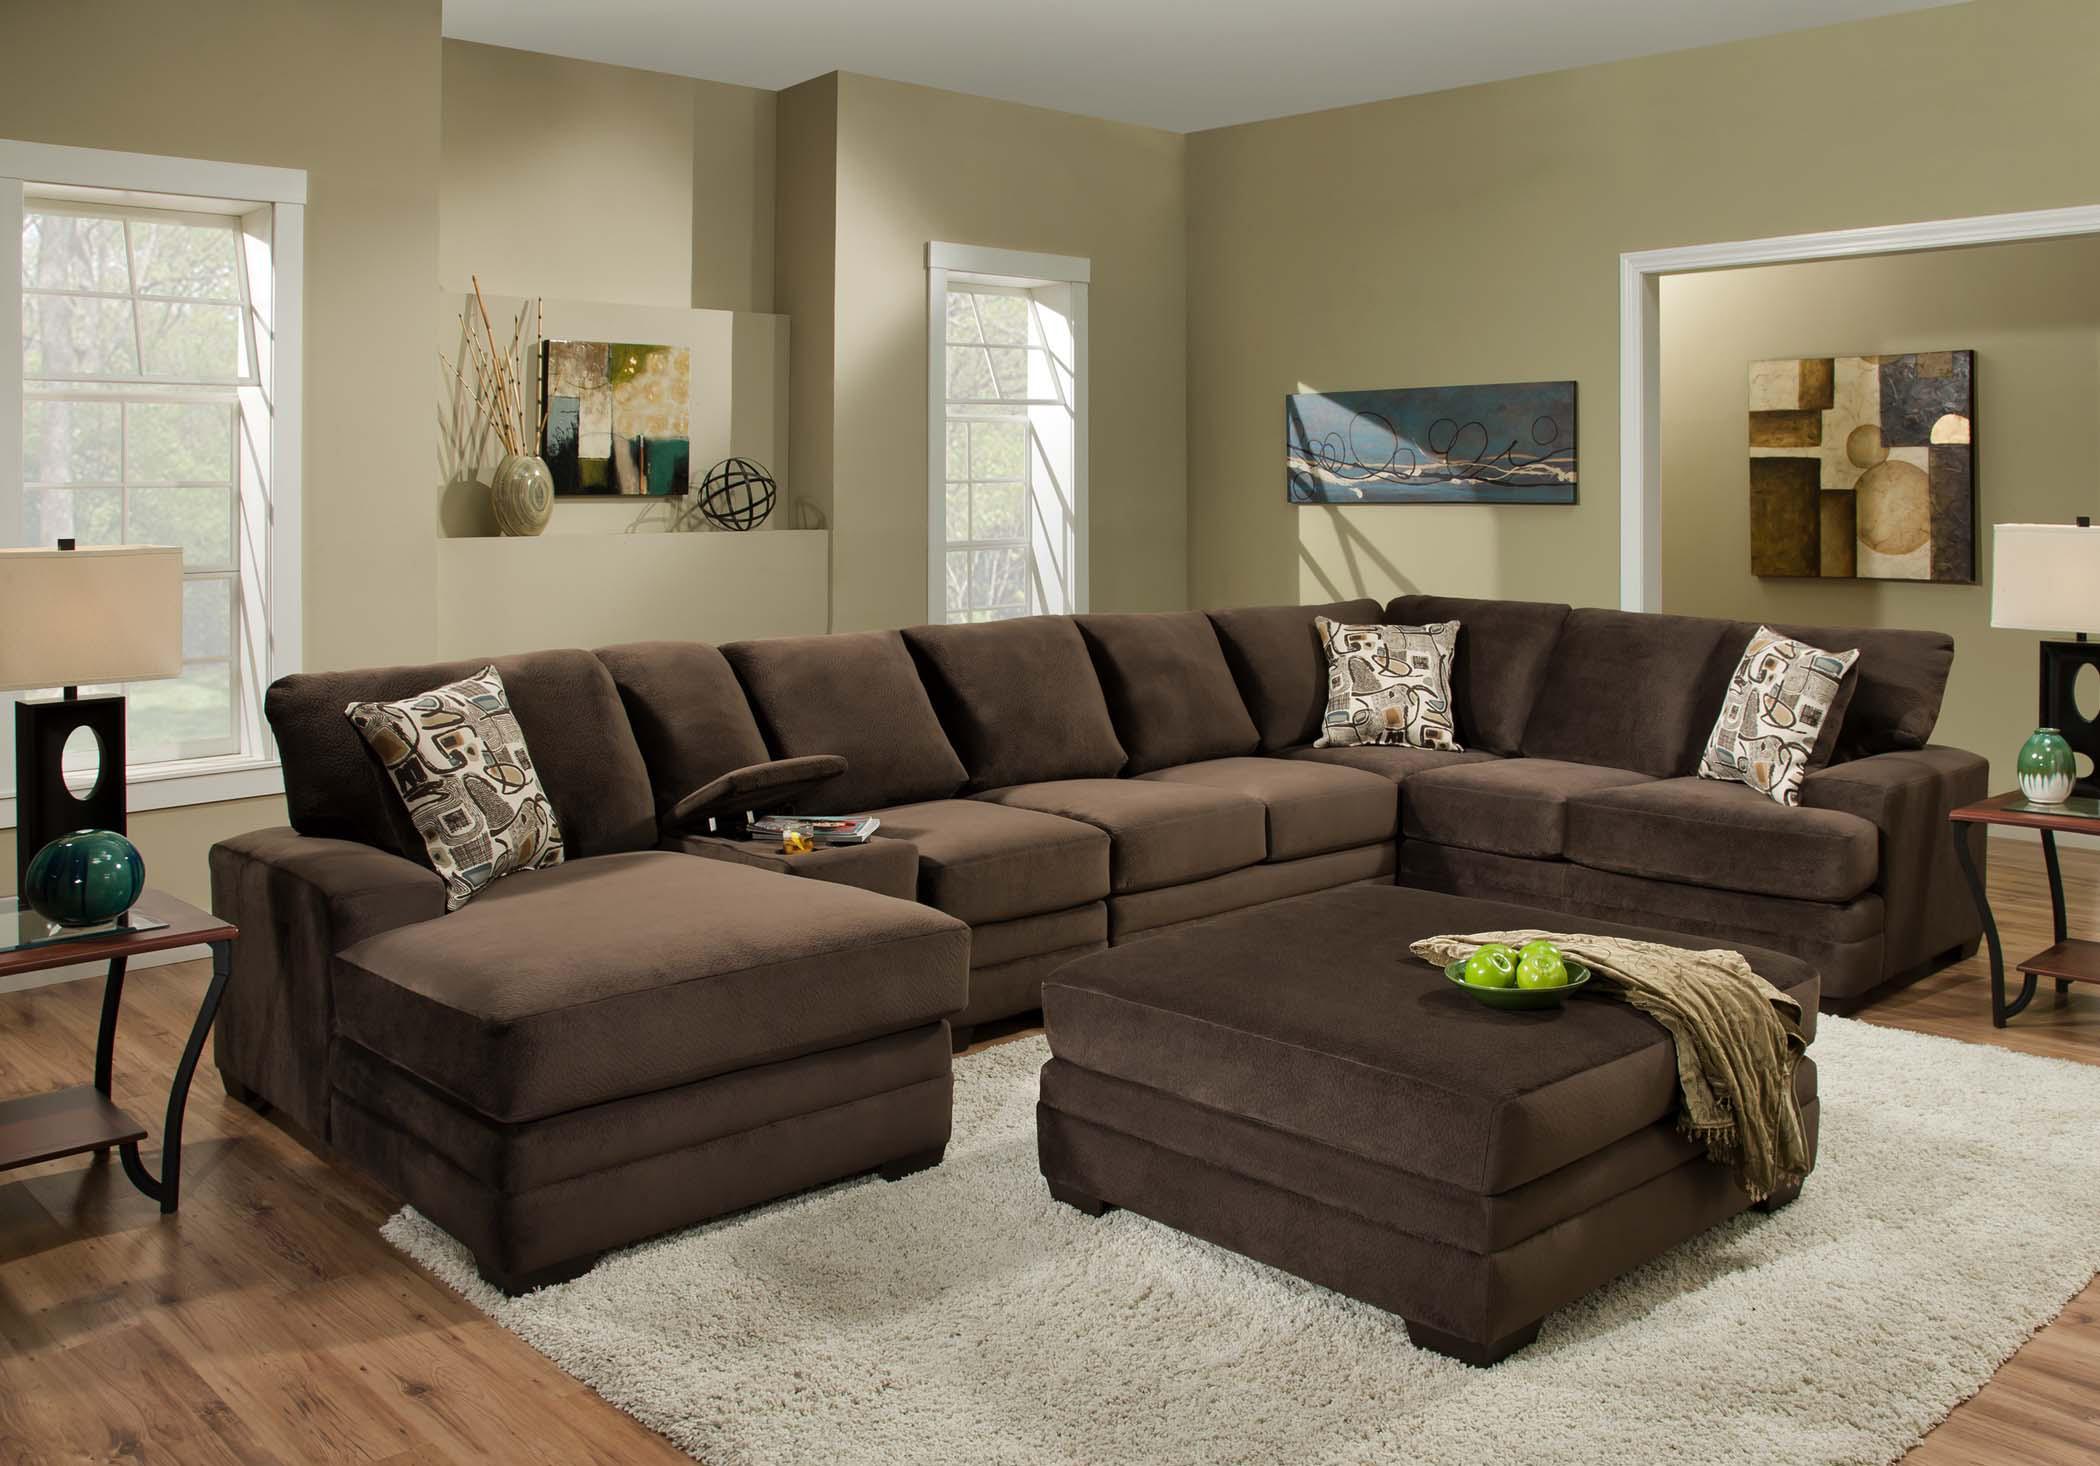 American Furniture 3500 Stationary Living Room Group Miskelly Furniture Stationary Living